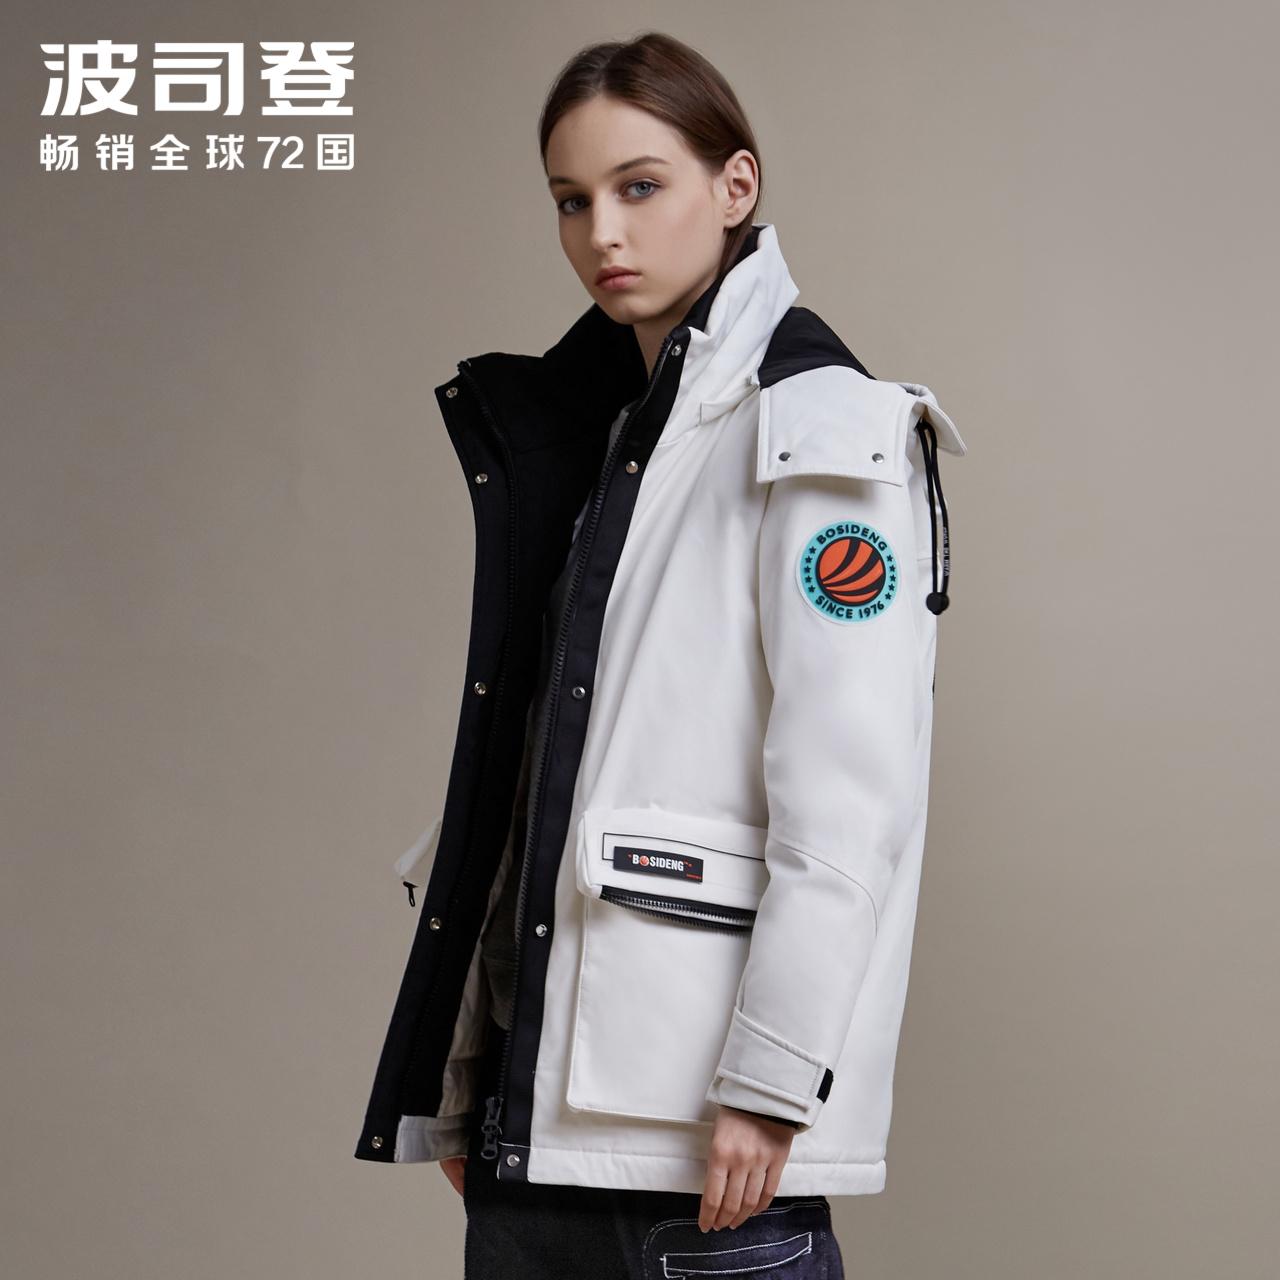 B90142520DS2019波司登女短款羽绒服冬保暖新款时尚可脱卸帽外套